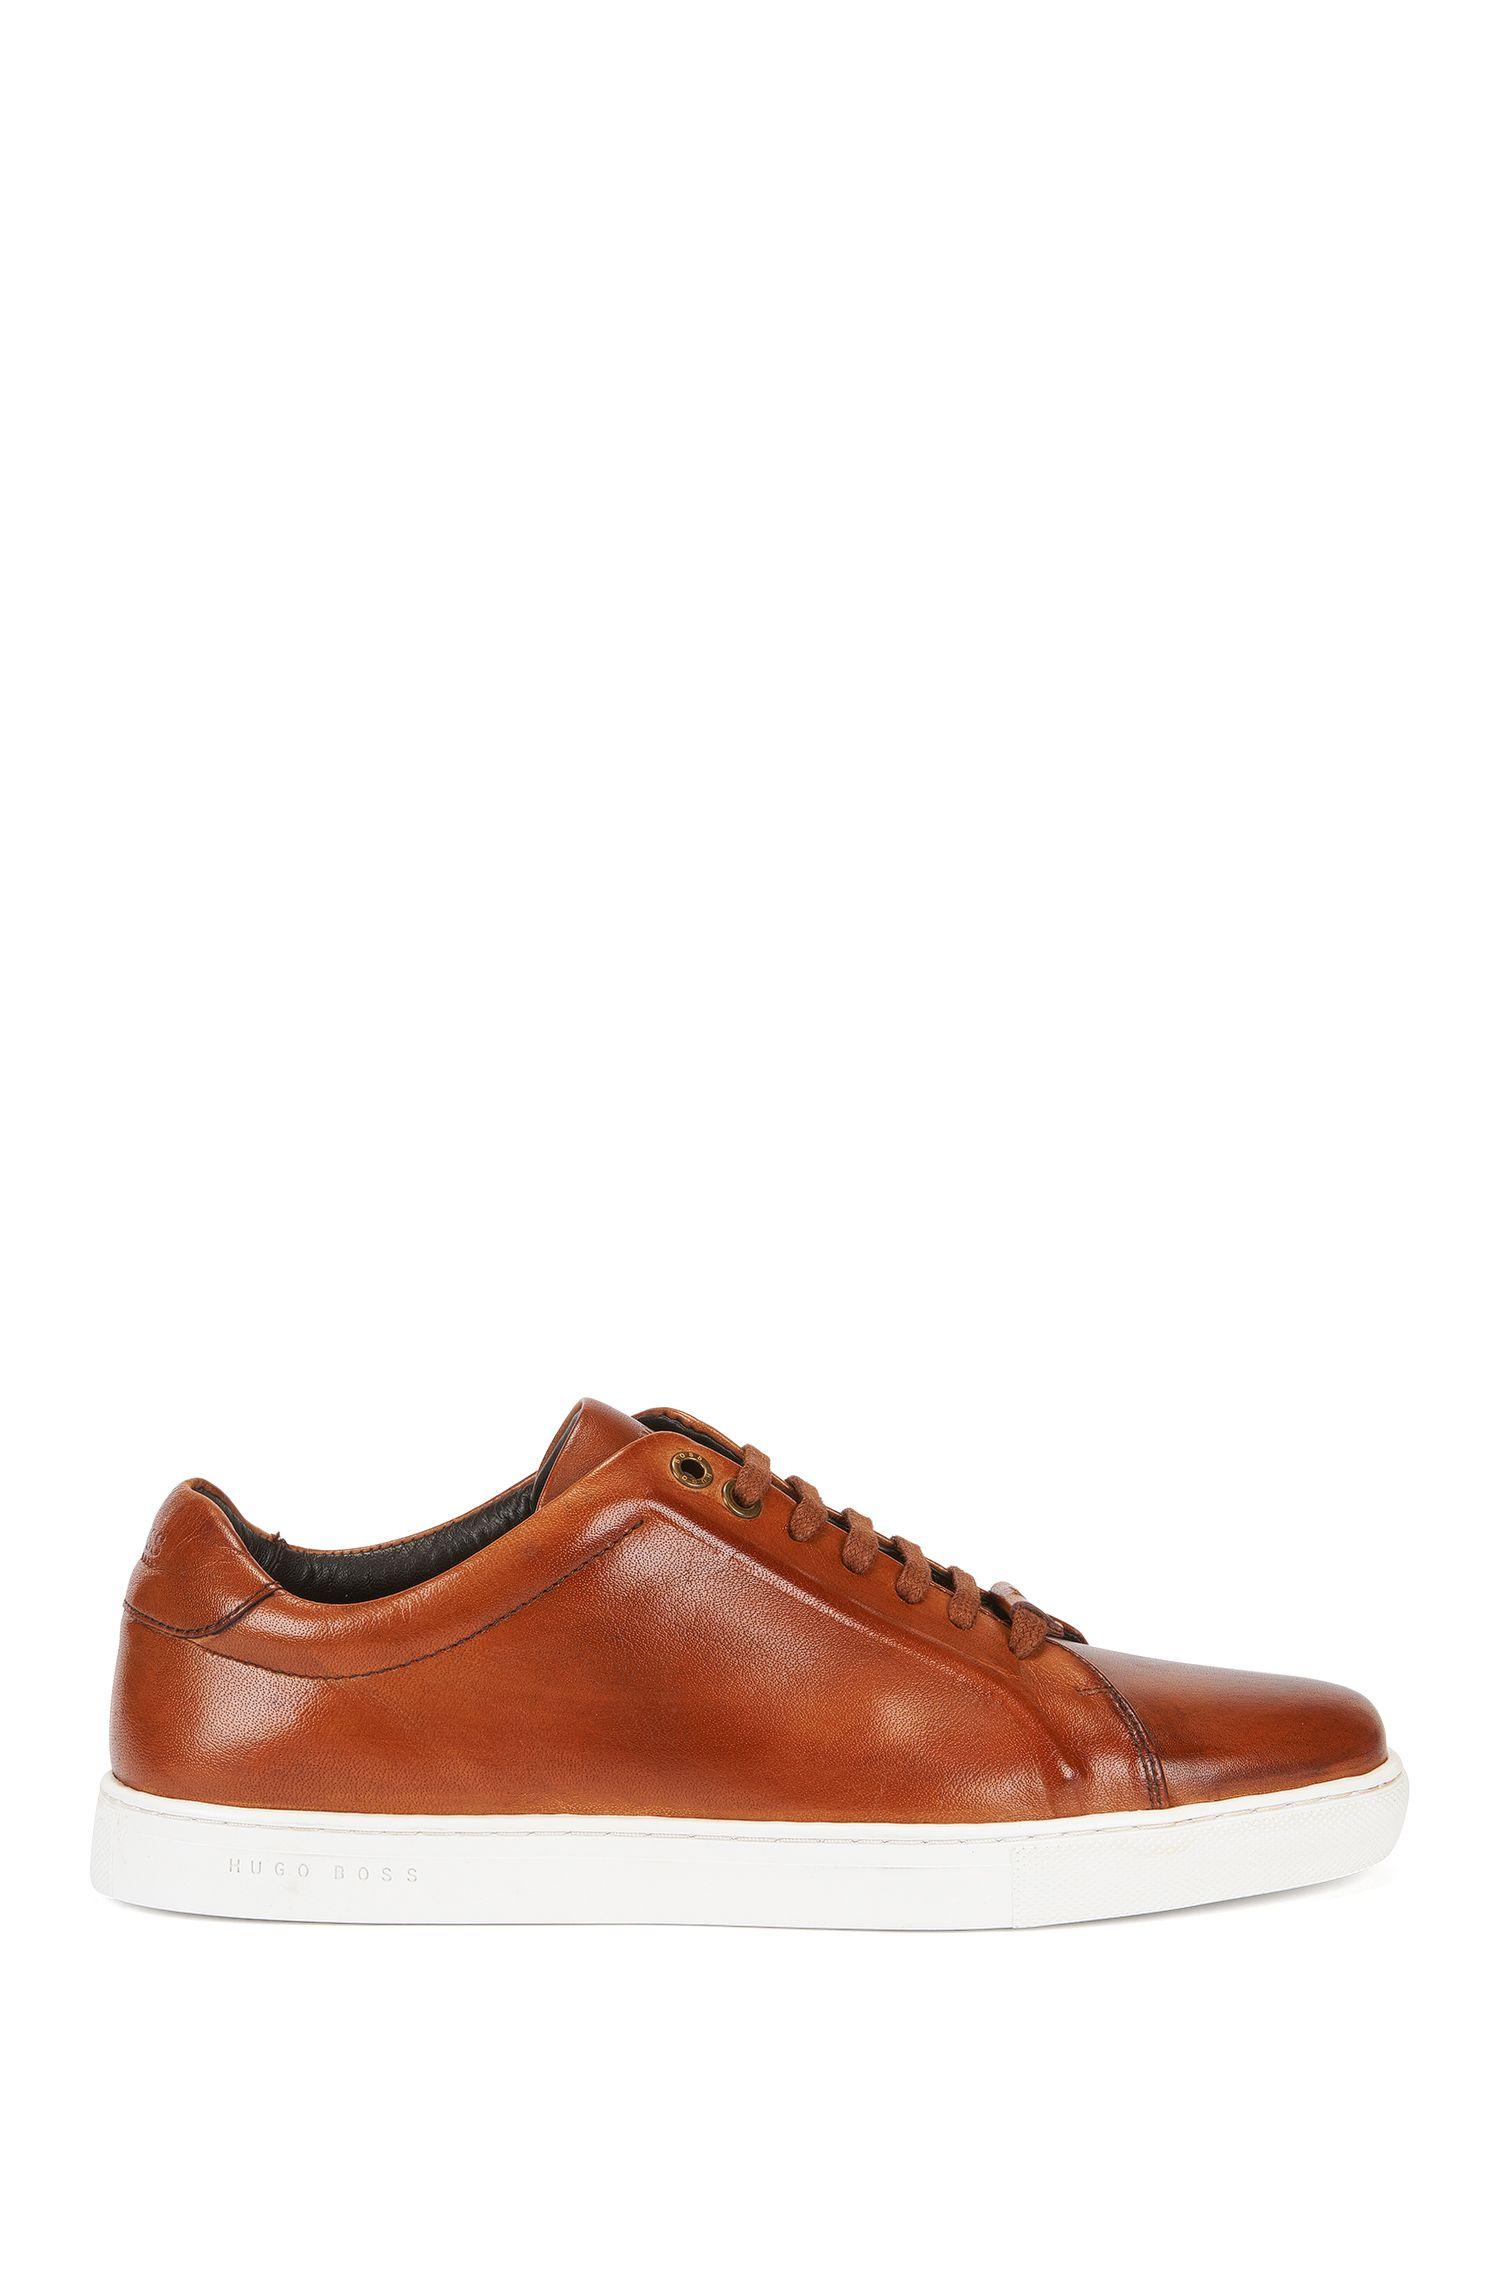 Sneakers stringate in pelle di bufalo